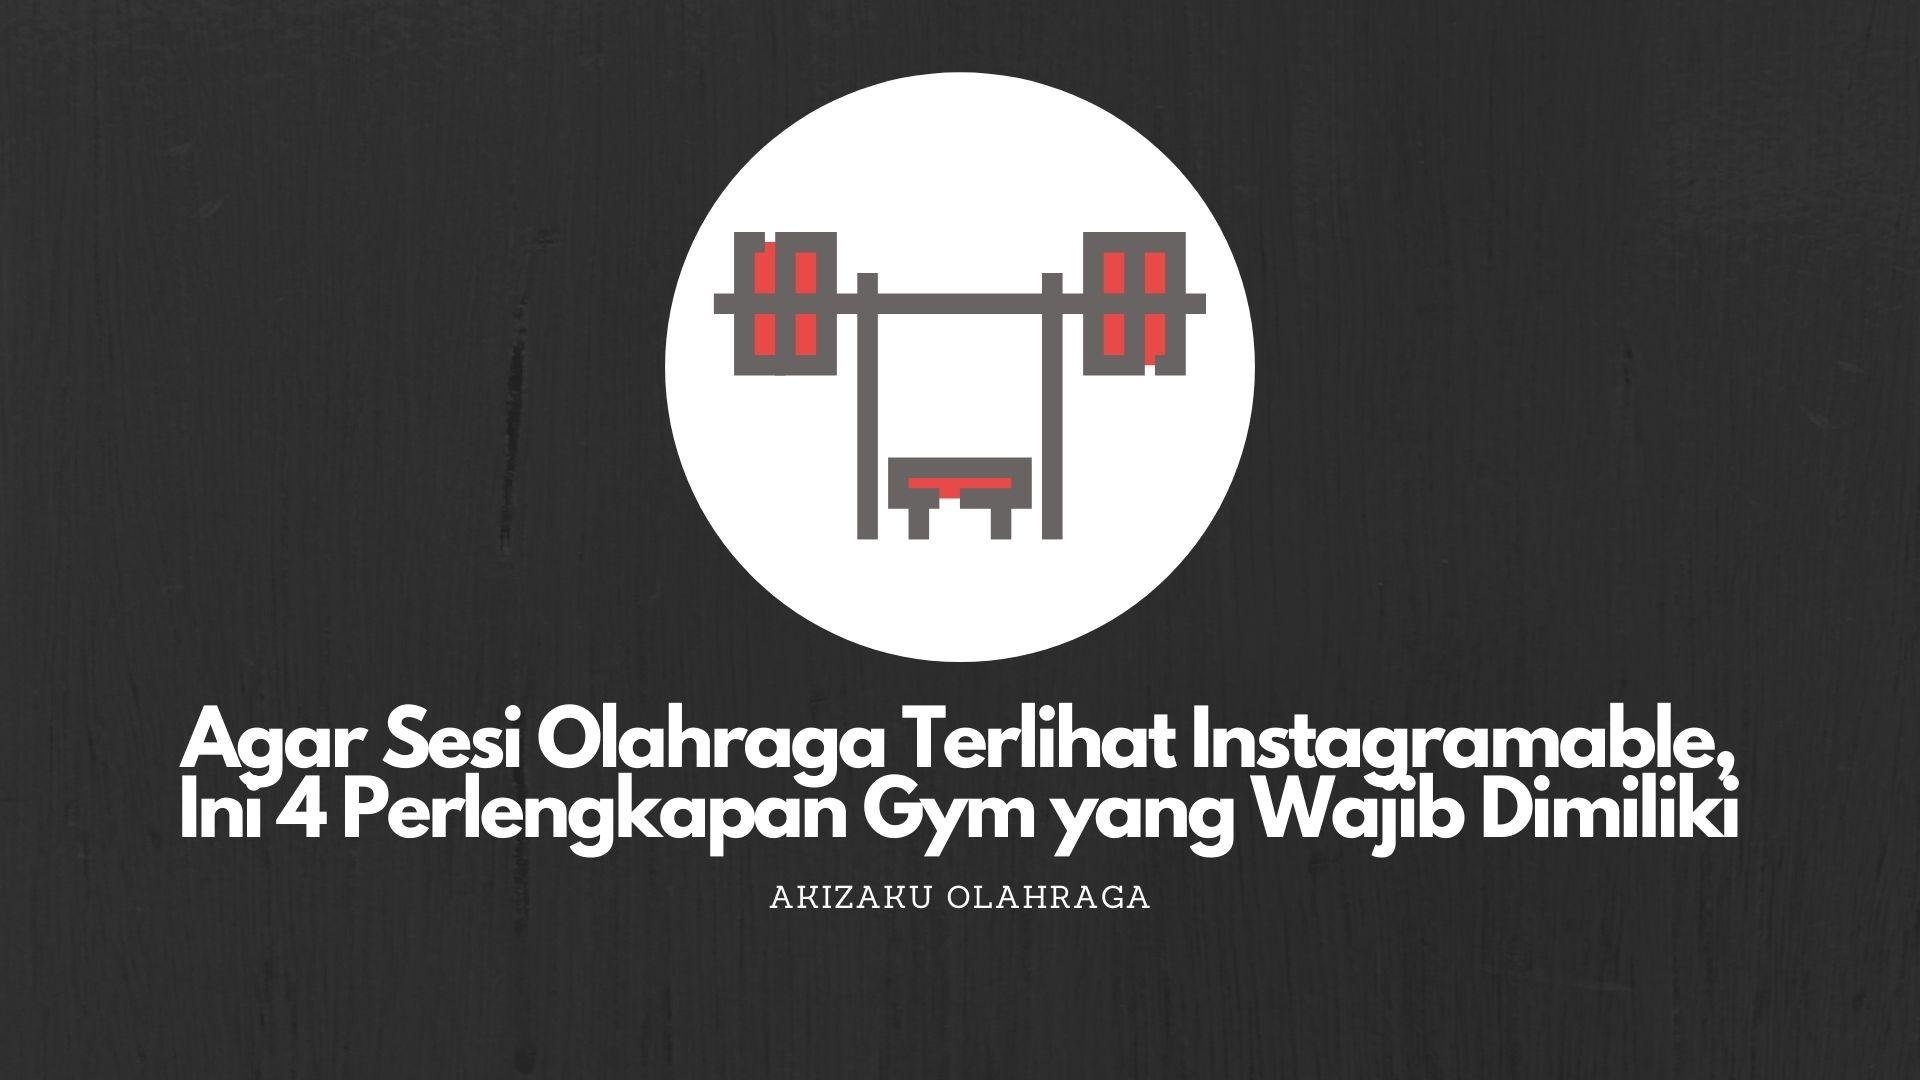 [Image: Agar-Sesi-Olahraga-Terlihat-Instagramabl...liki-2.jpg]